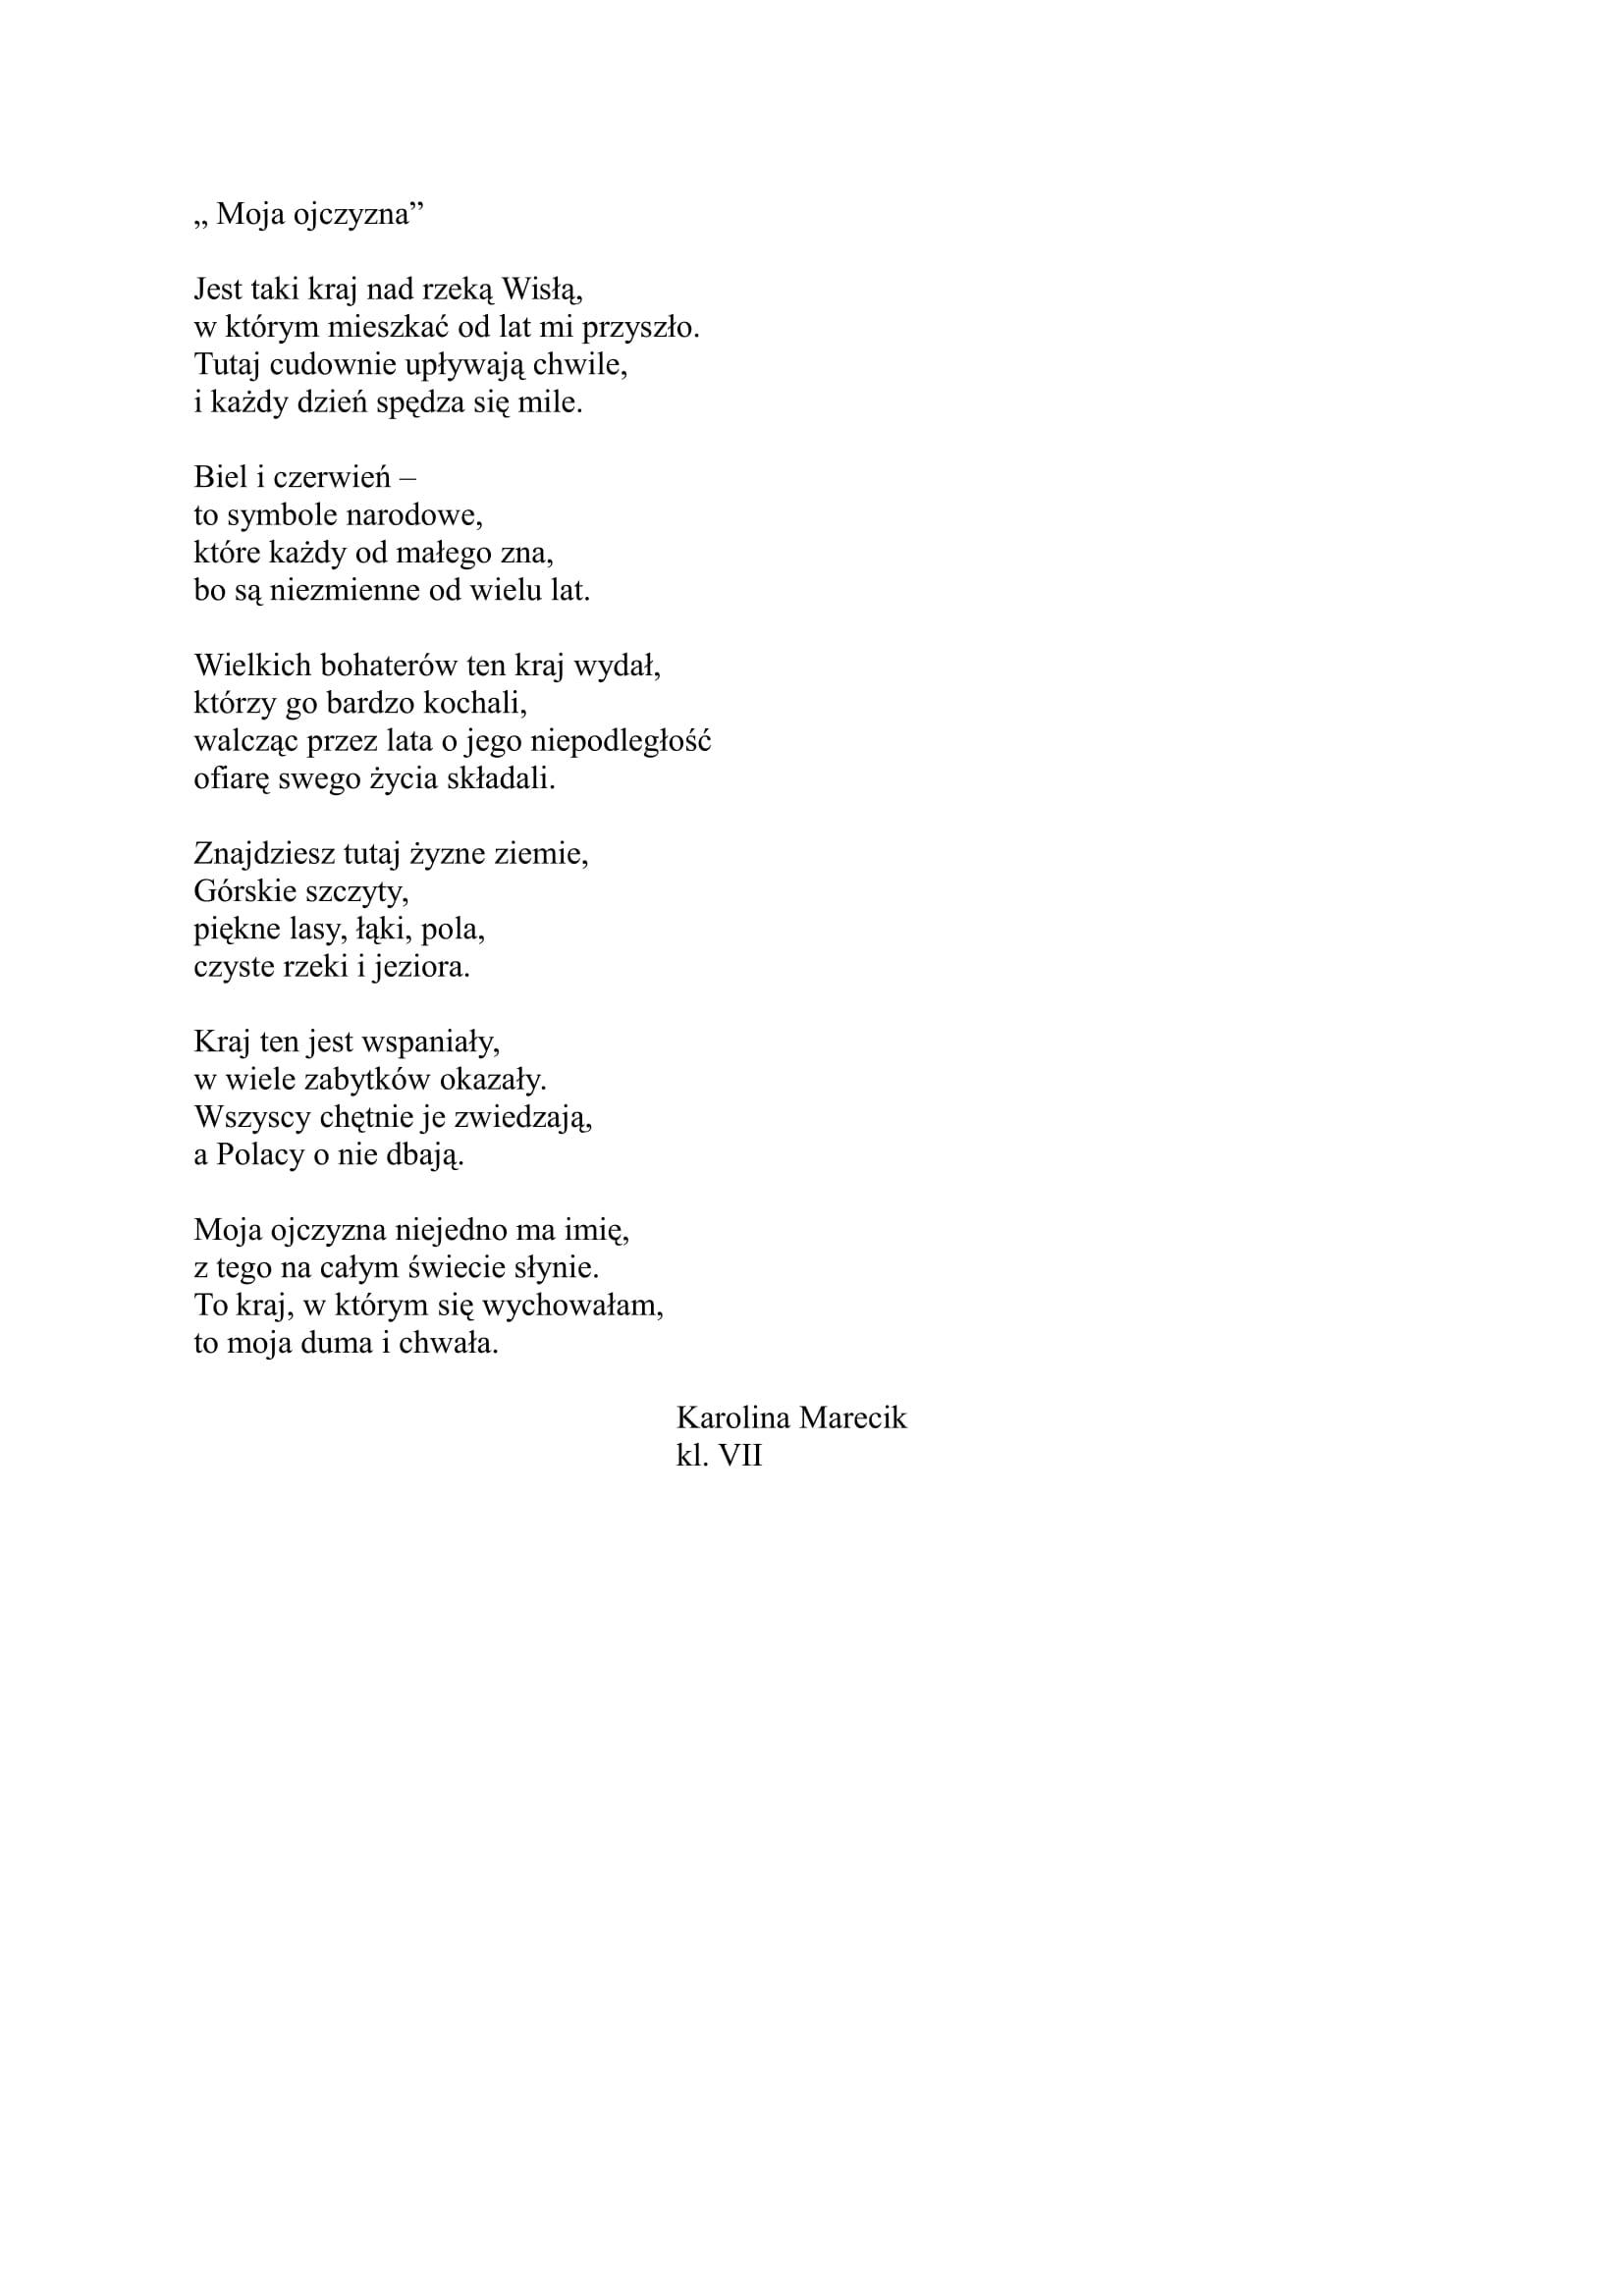 Moja ojczyzna - Karolina Marecik-1